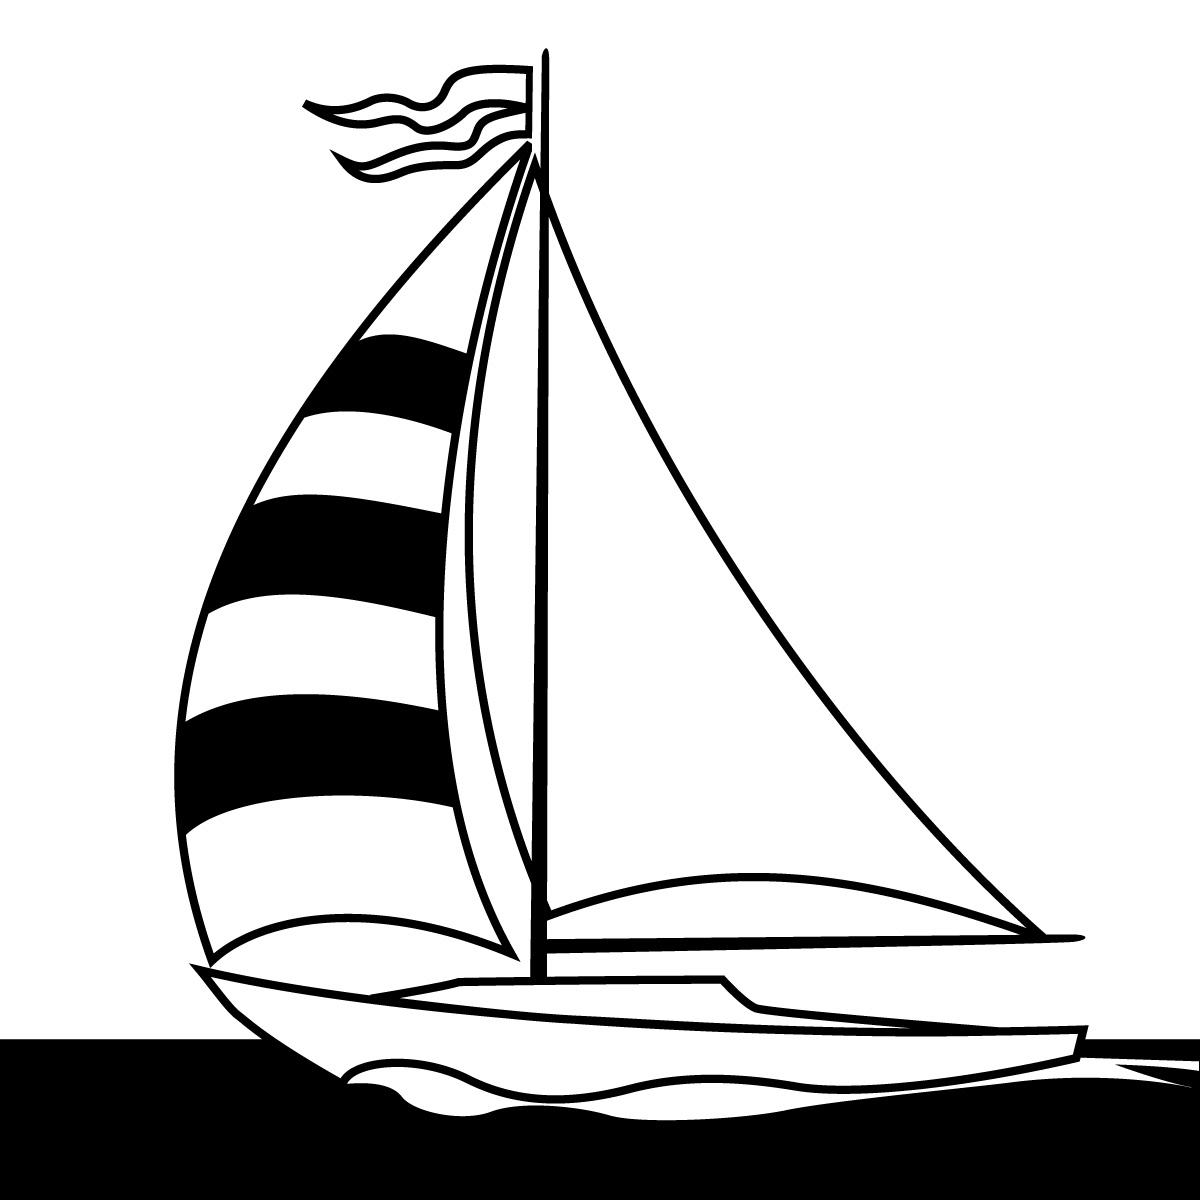 Sailboat clipart #8, Download drawings